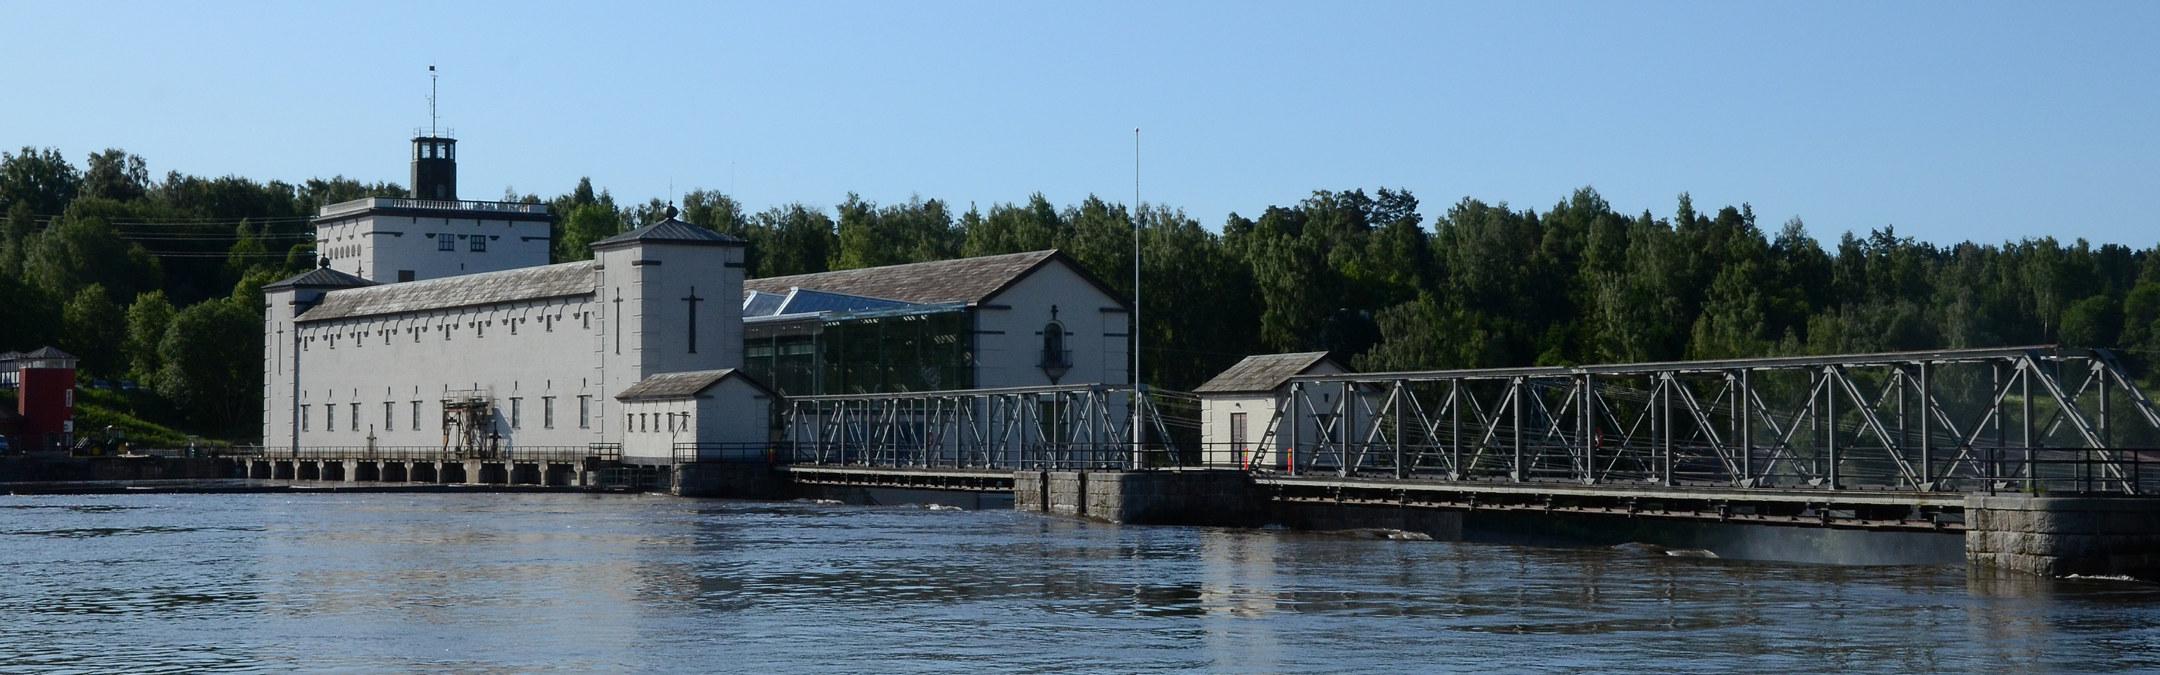 Foto: Kraftstasjonen Rånosfoss